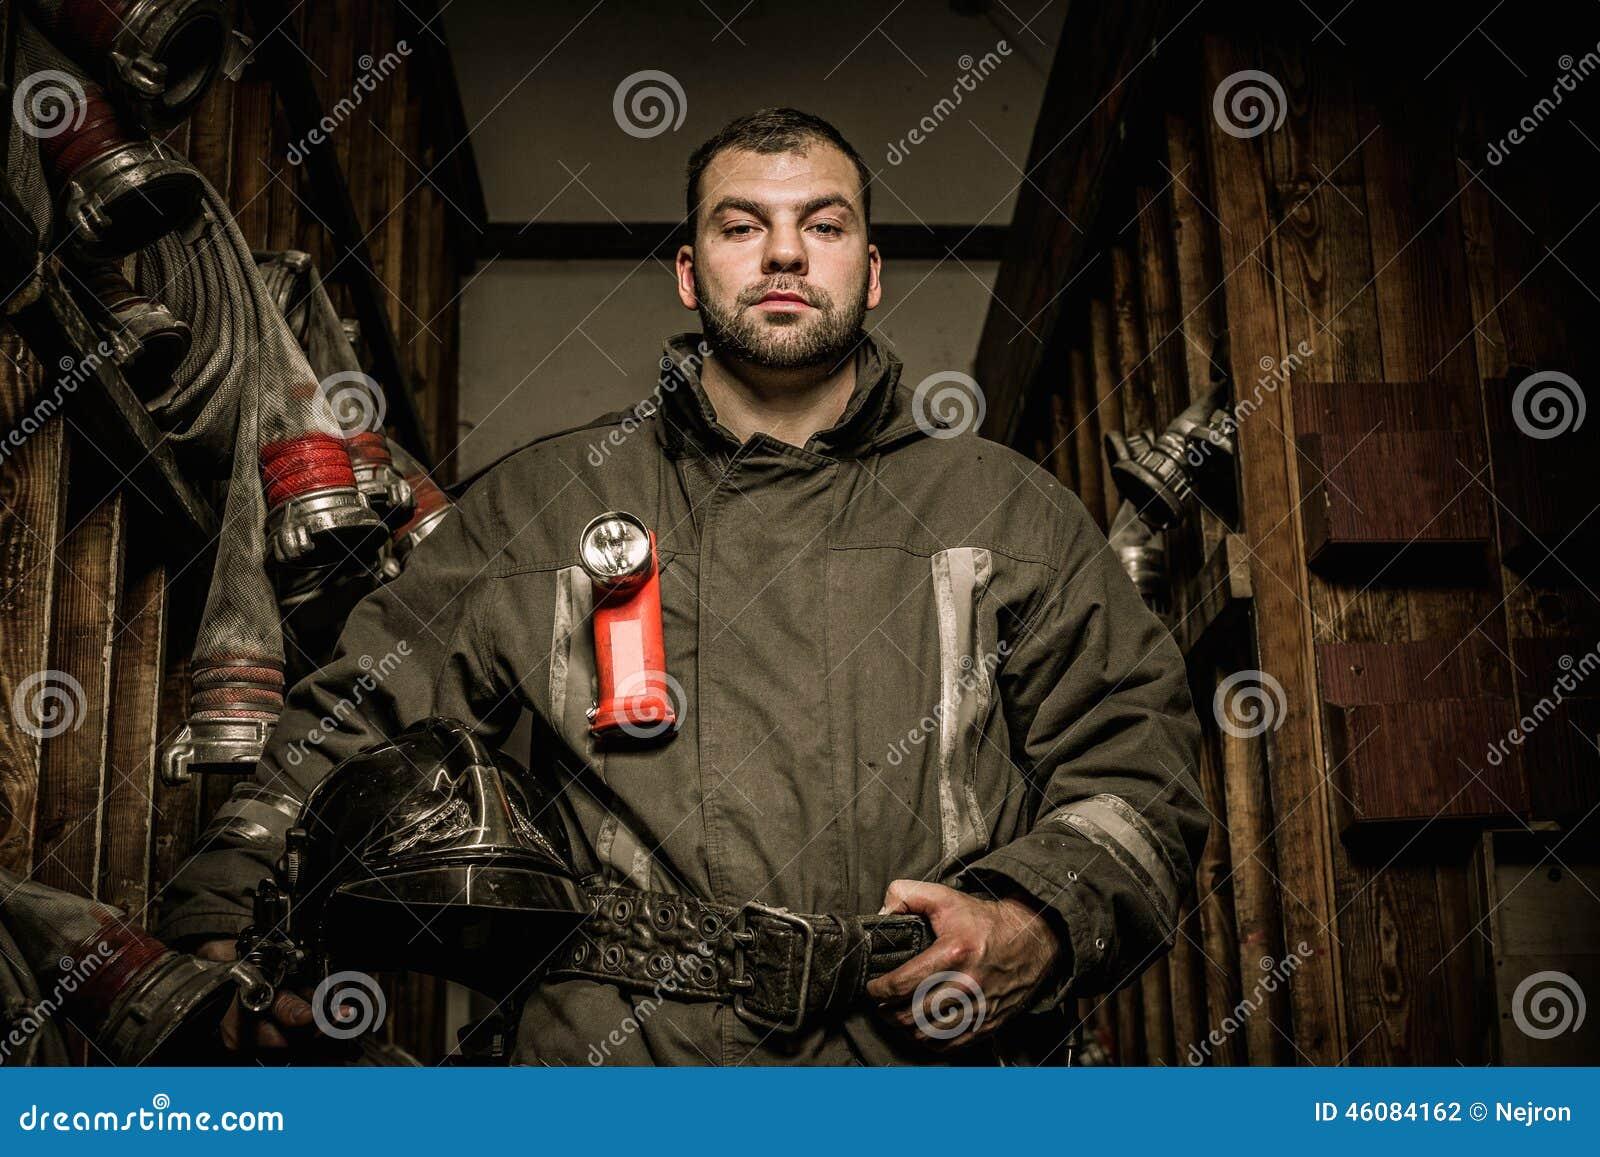 Firefighter in storage room